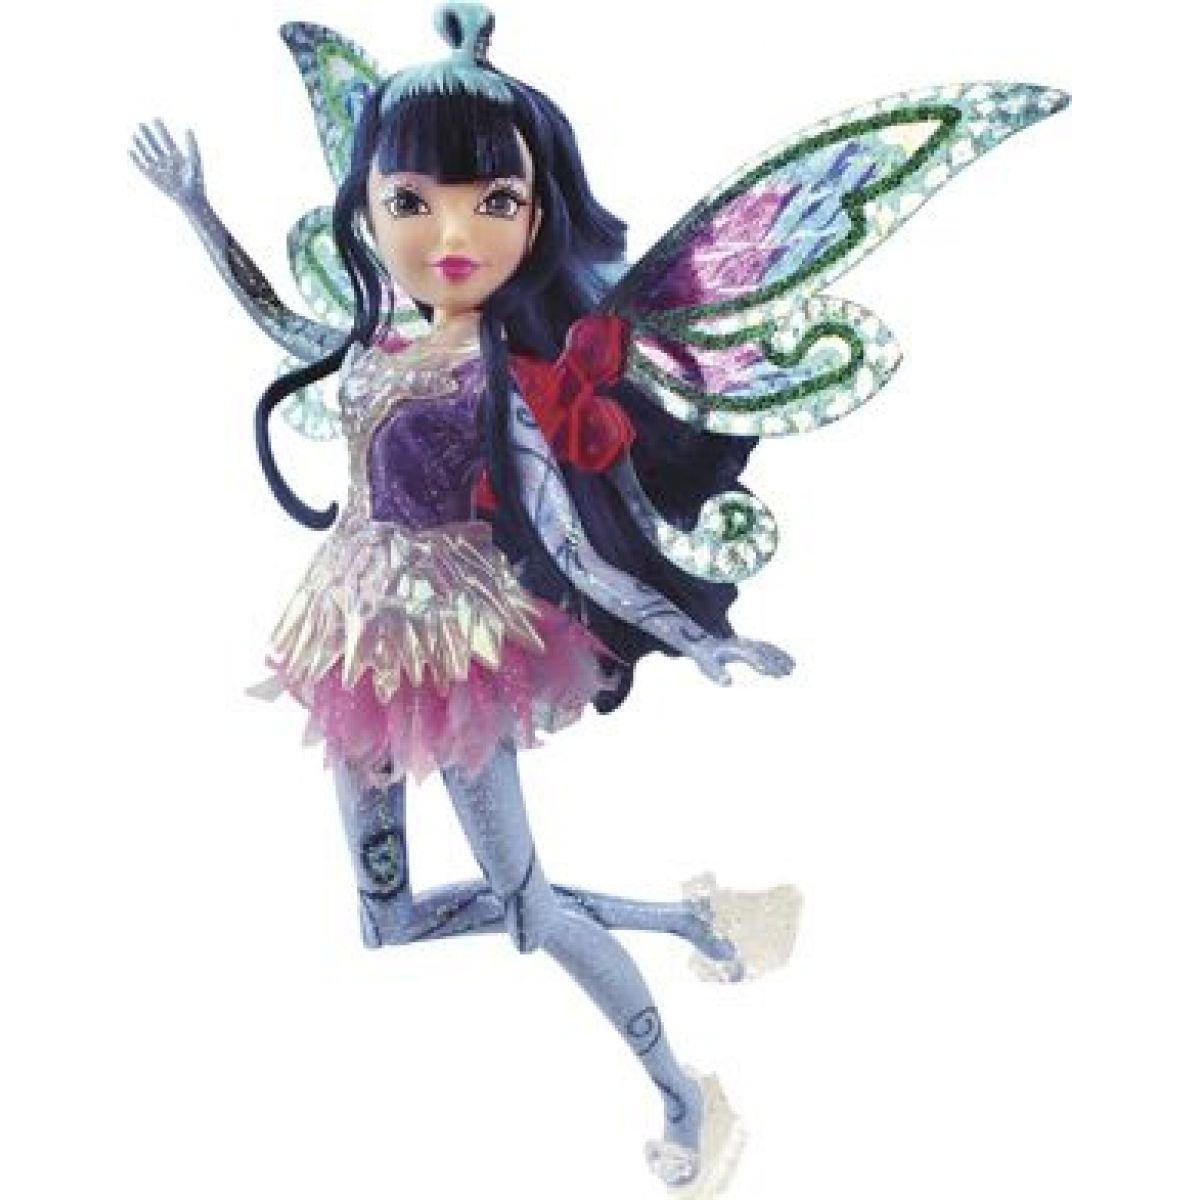 Winx Bábika Tynix Fairy - Músa